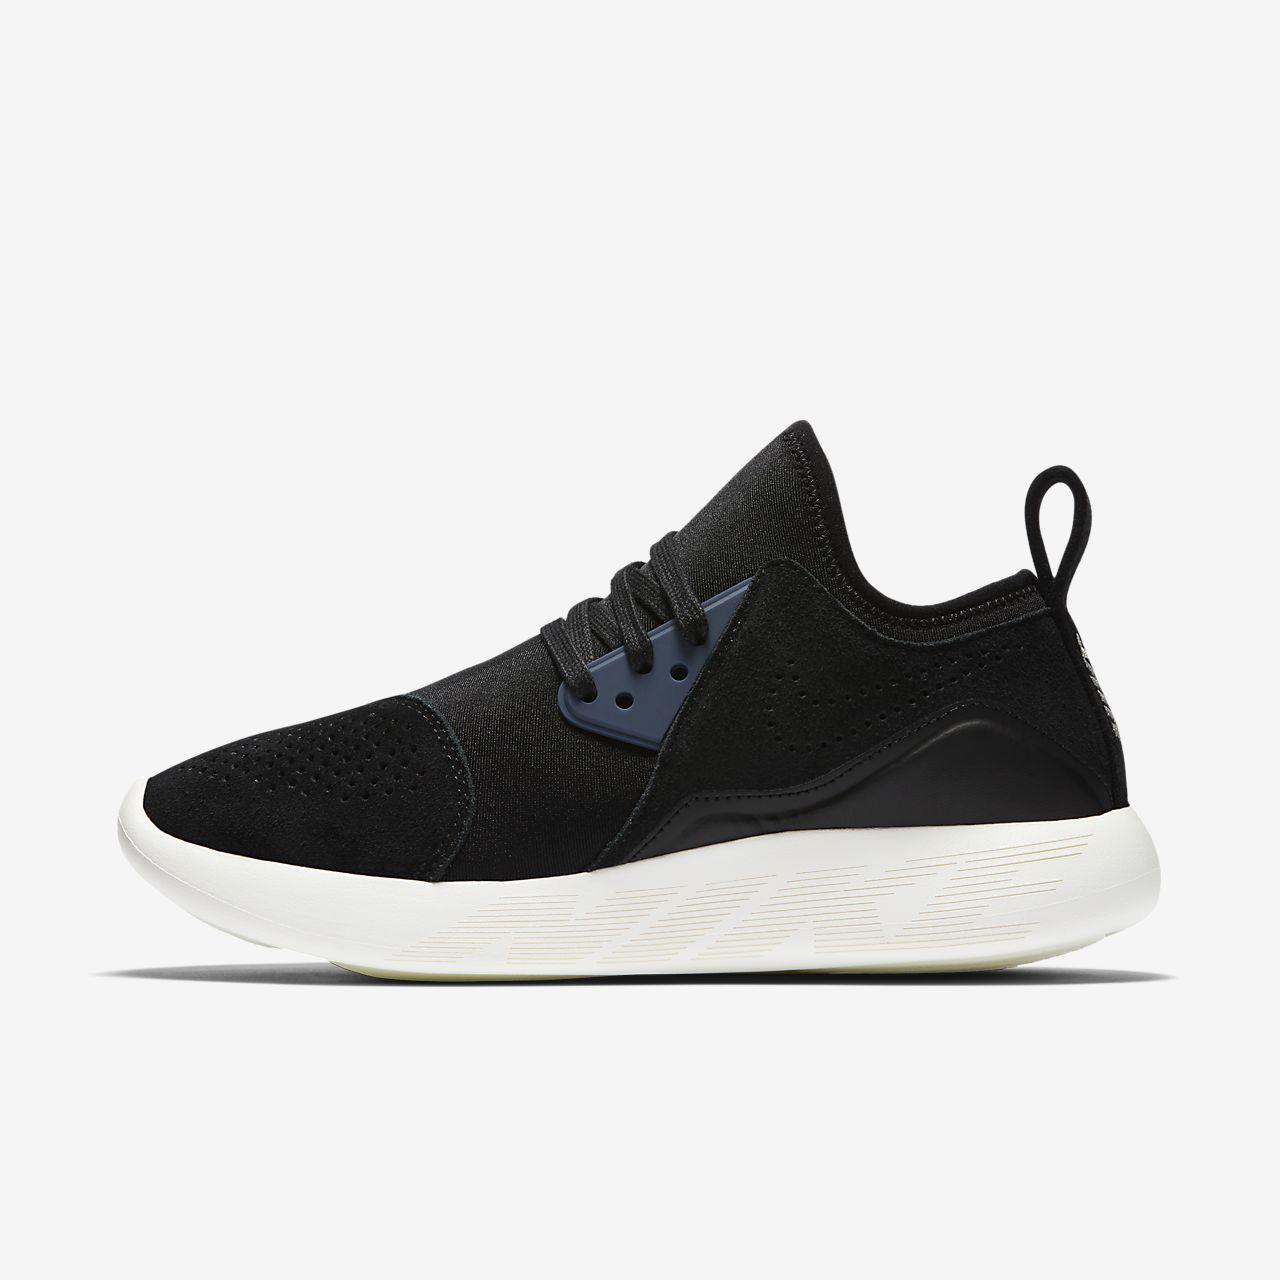 aclaramiento baúl finishline venta nueva llegada Nike Para Mujer Premium De Carga Lunar Ropa VygicKh7ab